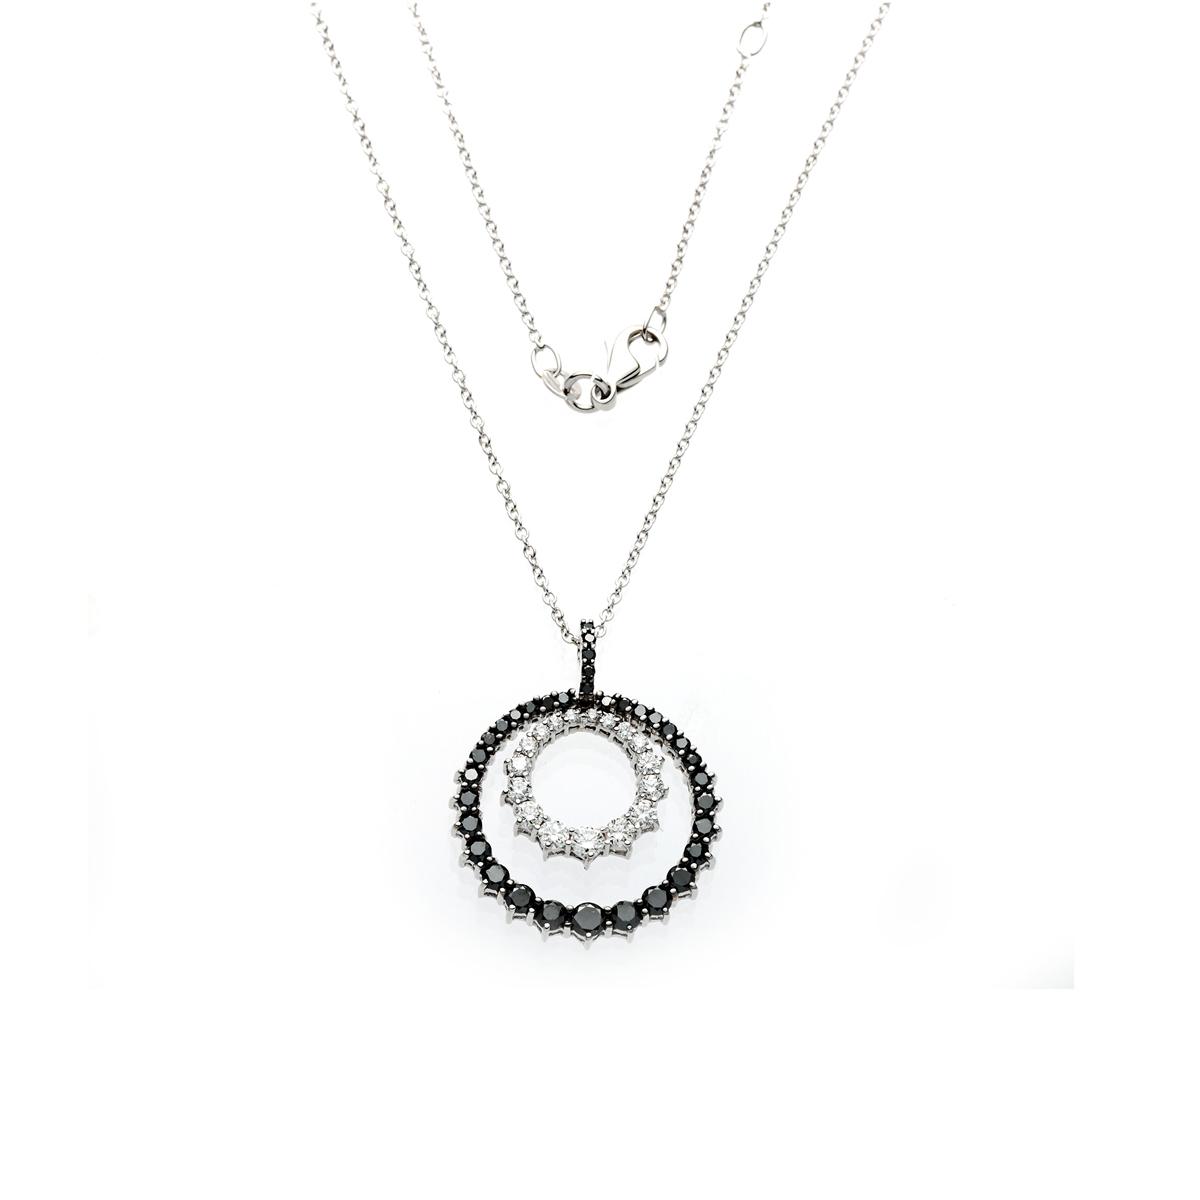 Black and White Diamond Circle Pendant Necklace